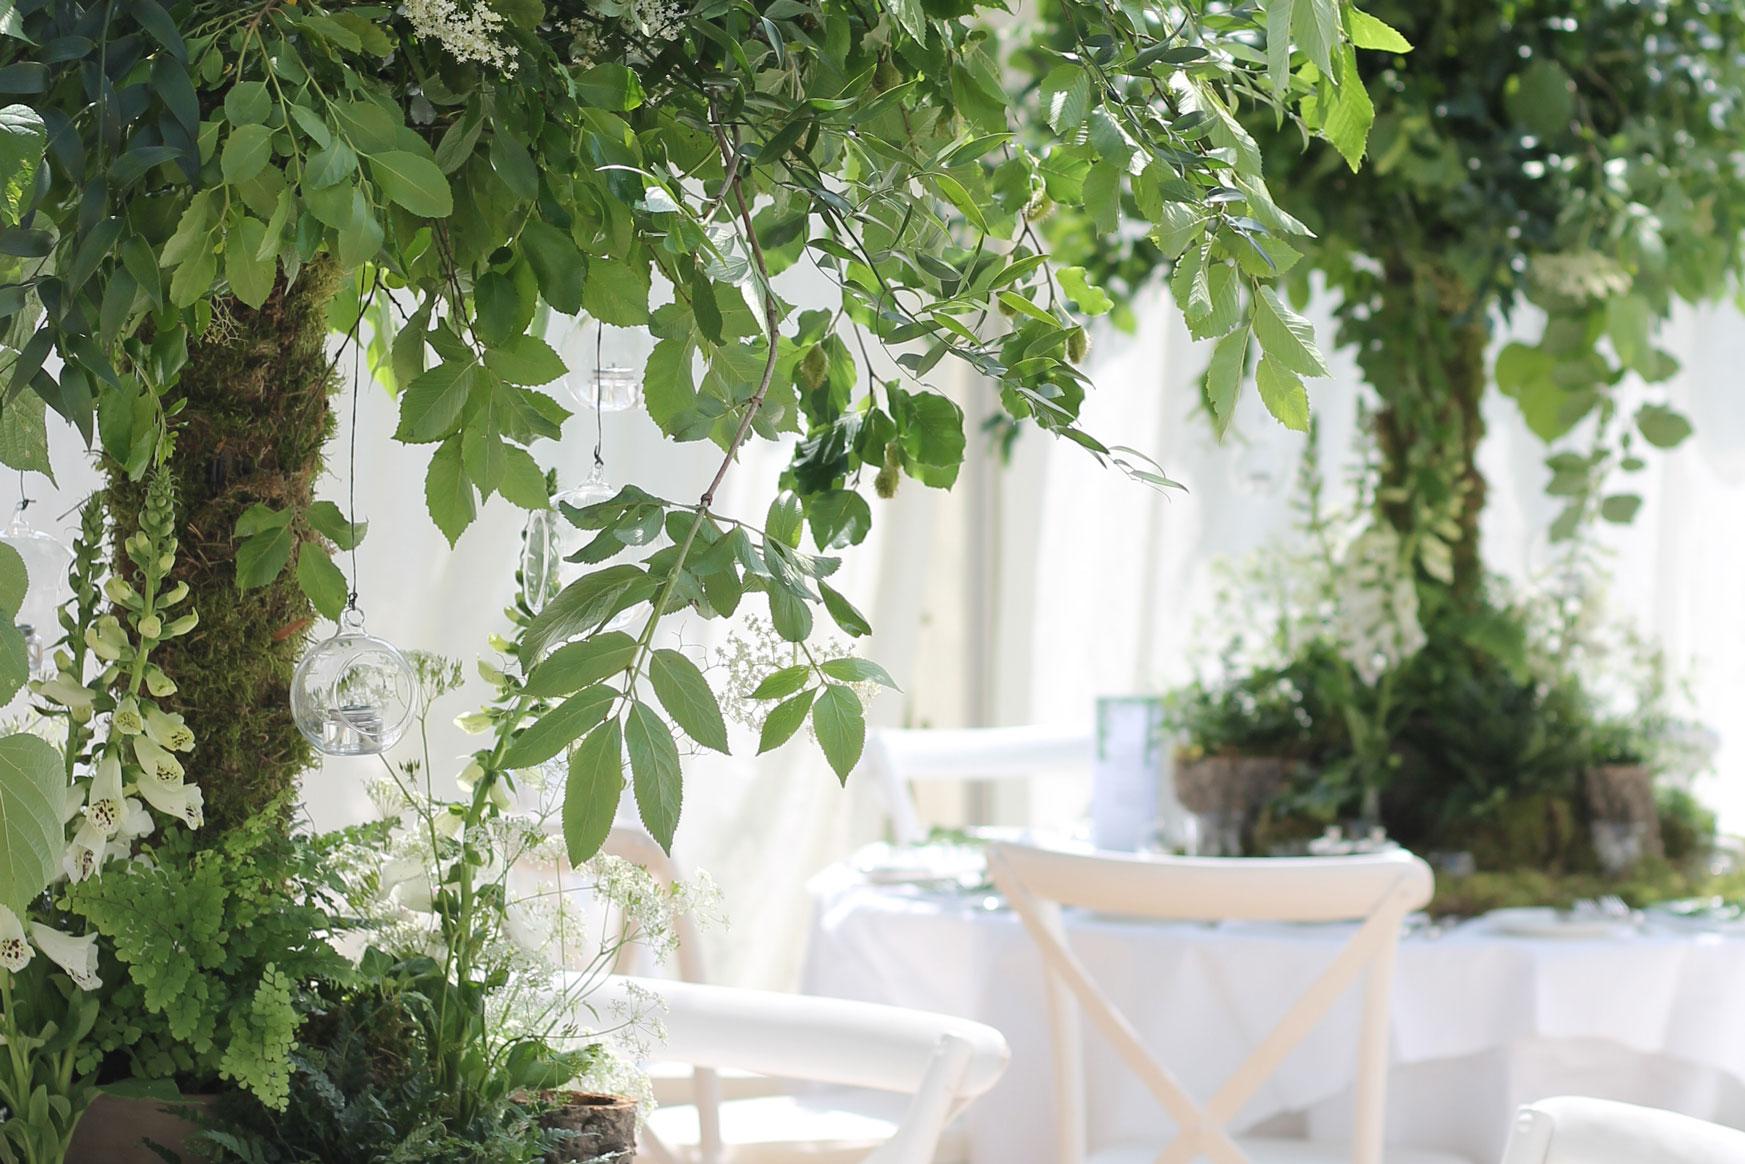 sarah-harper-floral-design-luxury-wedding-florist-flowers-oxfordshite-cotsworlds-gallery-Homepage-1-copy